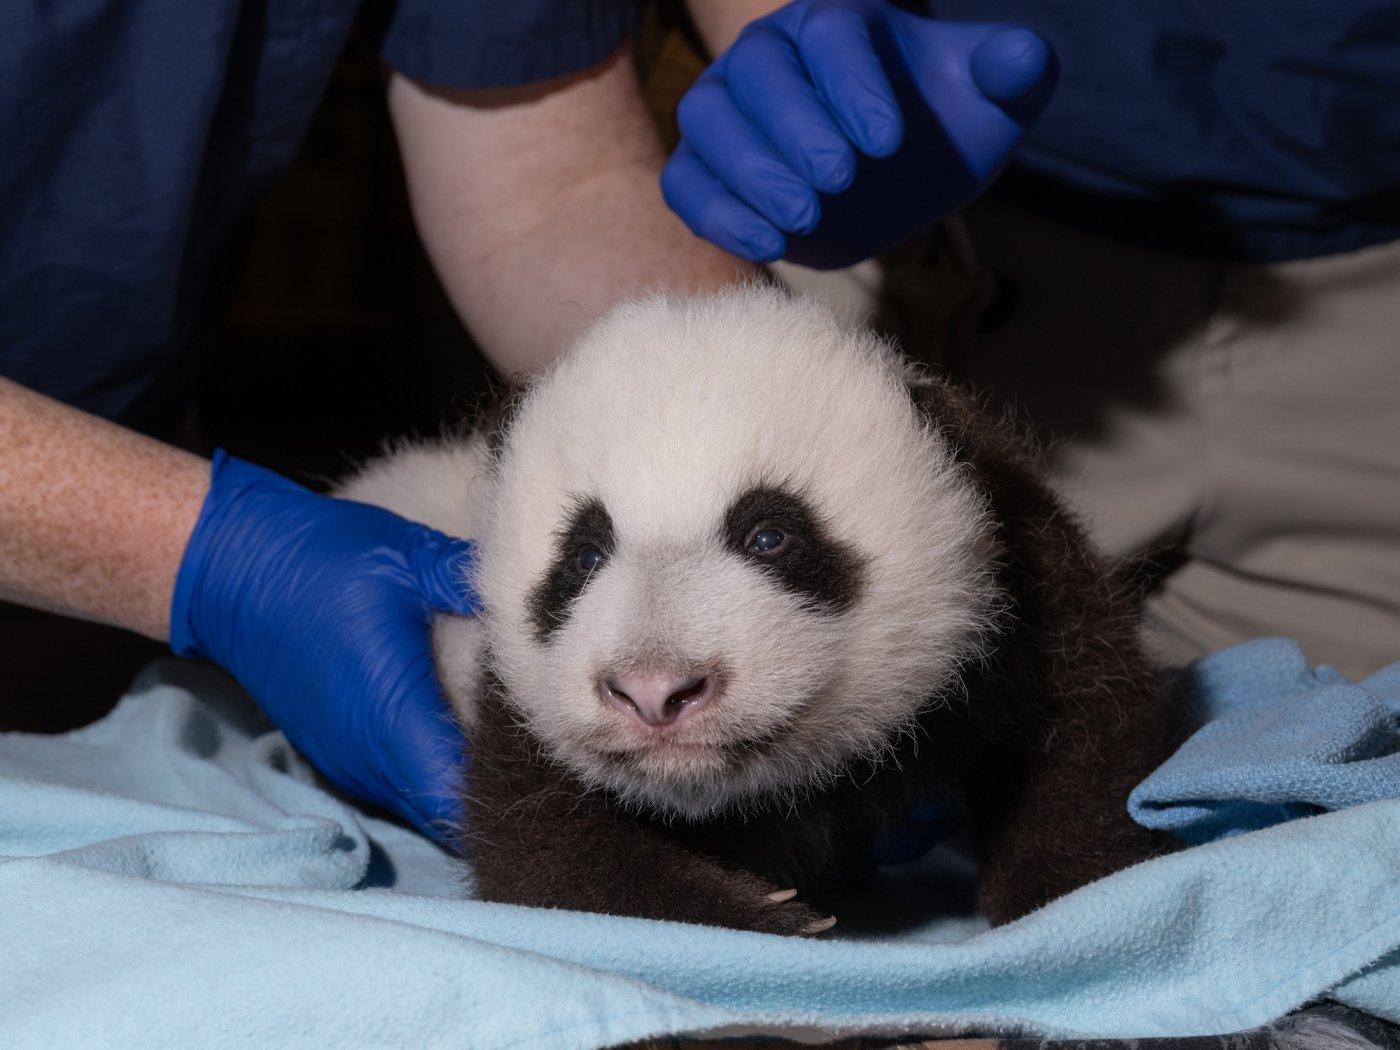 Photo courtesy of the National Zoo.